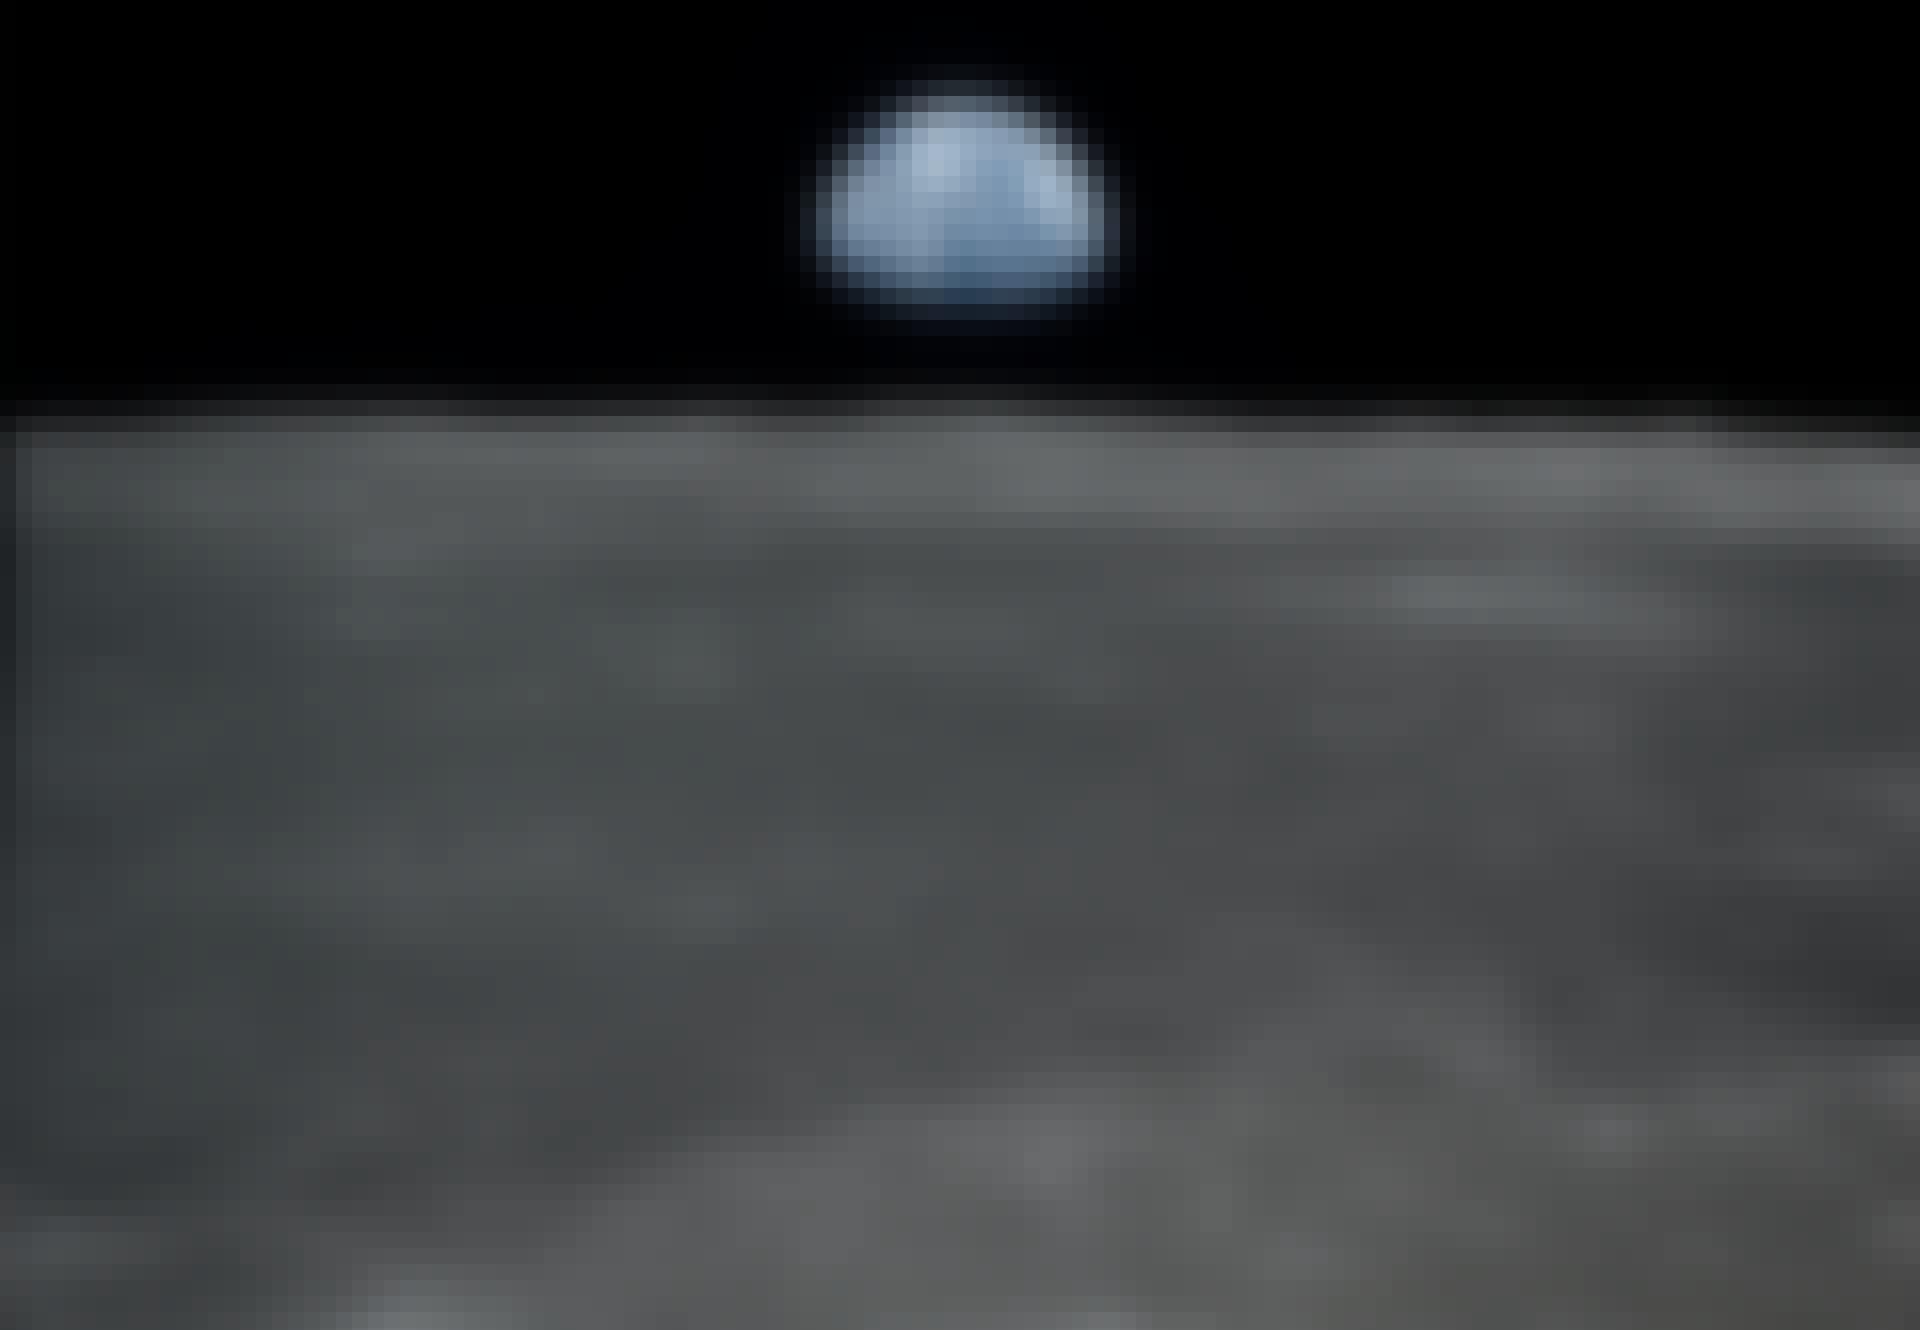 Månens overflade og Jorden set fra Apollo 11, 1969